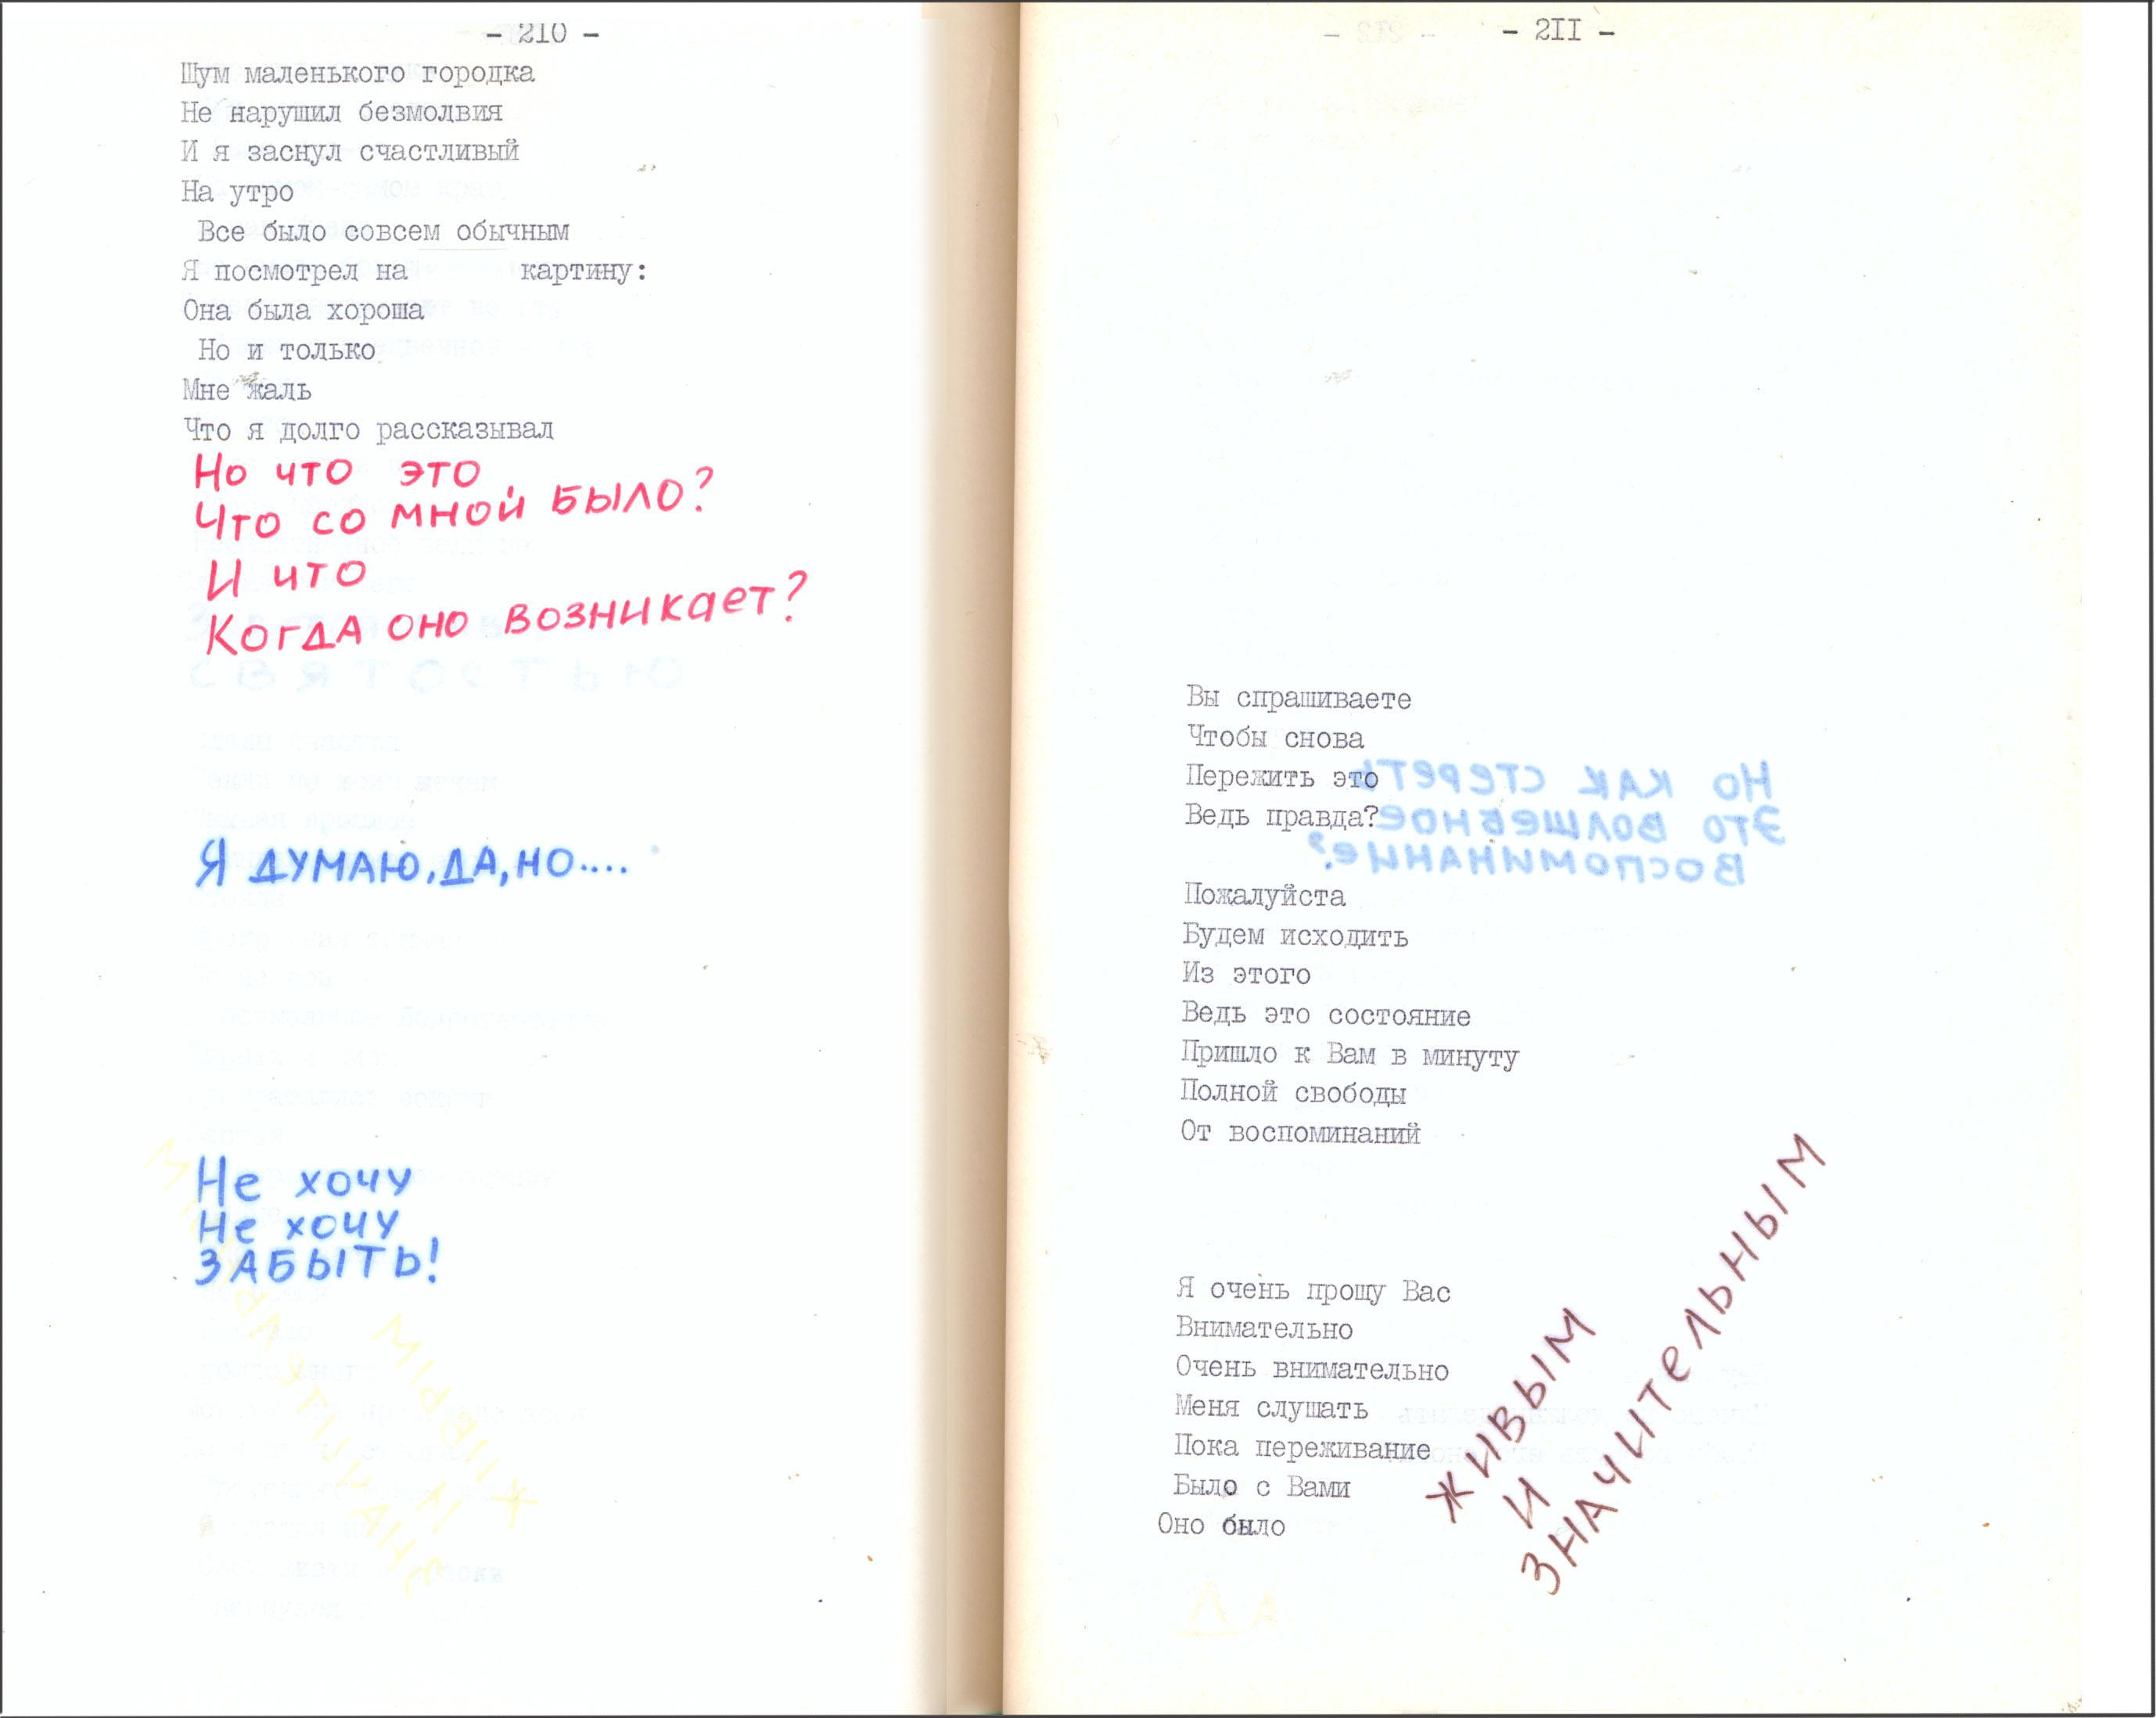 «Песни Кришнамурти» (Четвертая тетрадь)